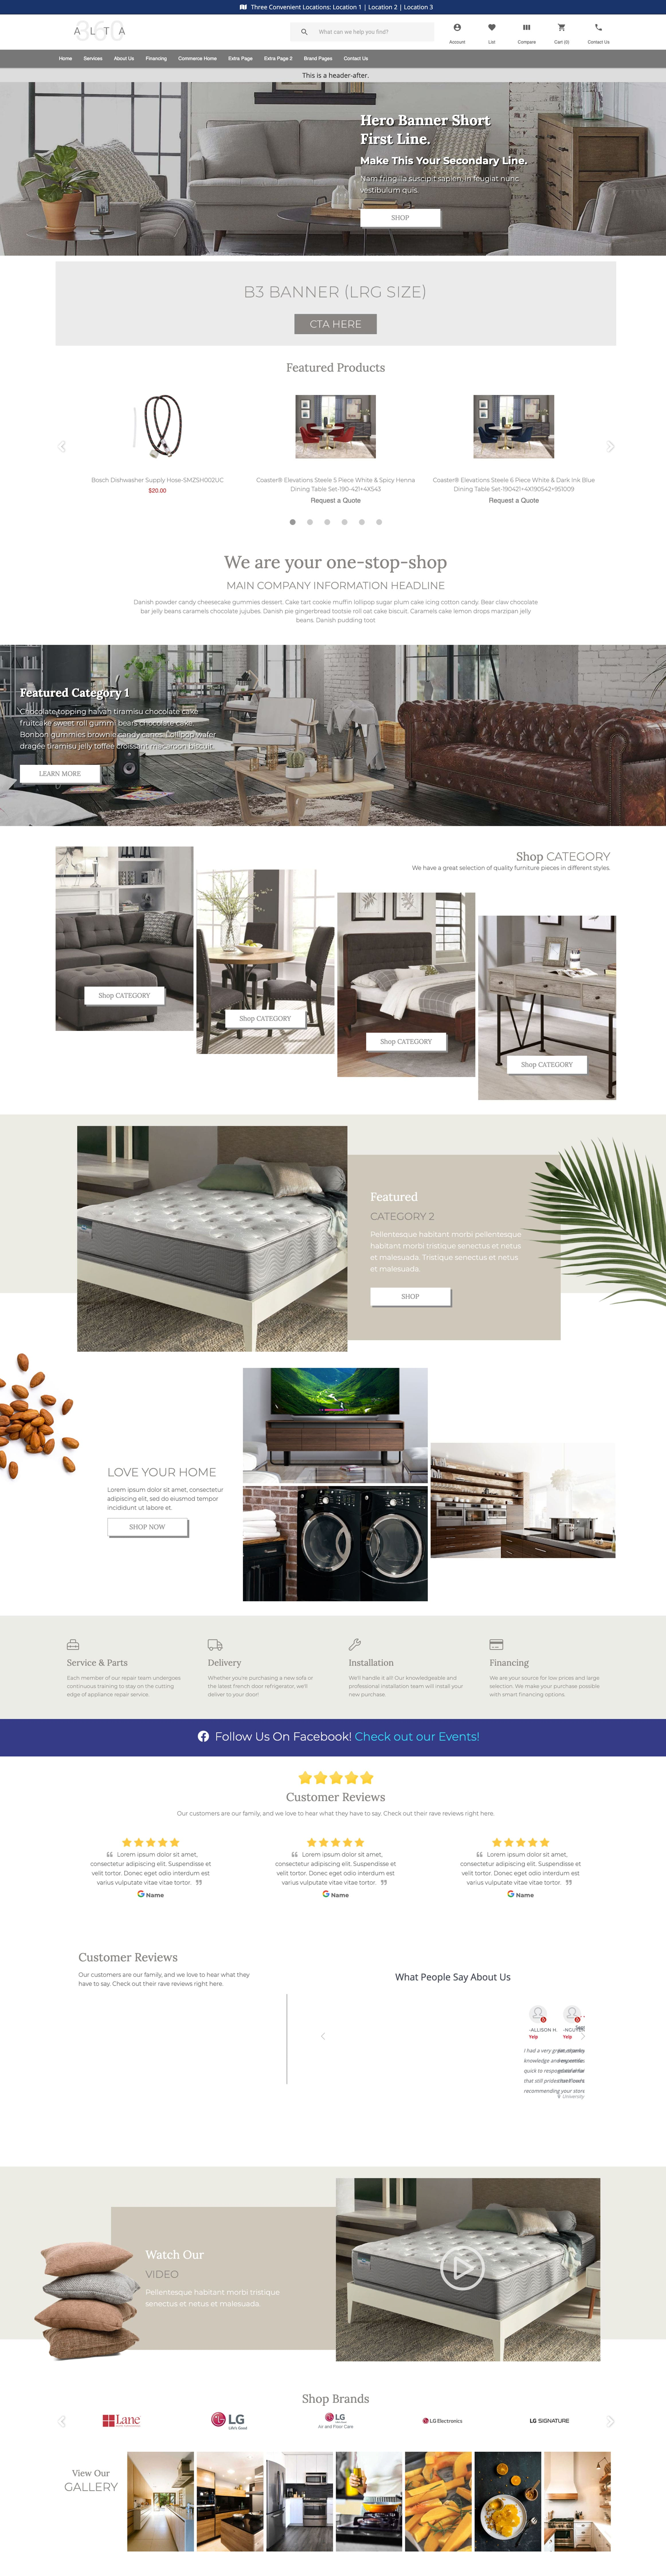 Website Themes - Alta 360 - Flora Fusion